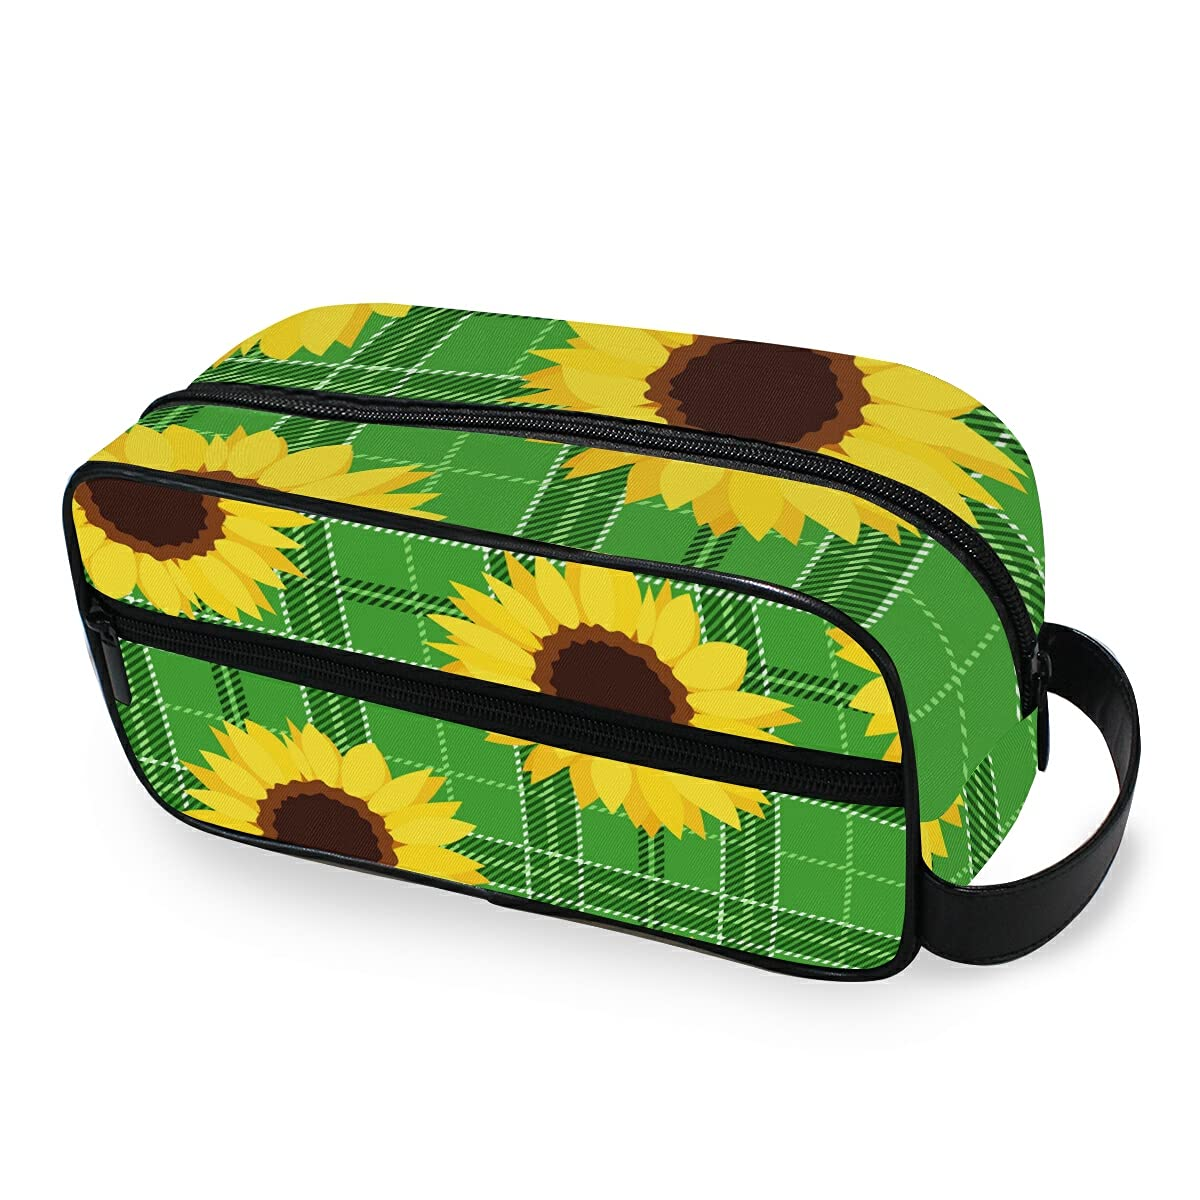 Travel Toiletry Bag Nylon Dopp Shaving Kit Year-end gift Green Limited time cheap sale Sunflowers